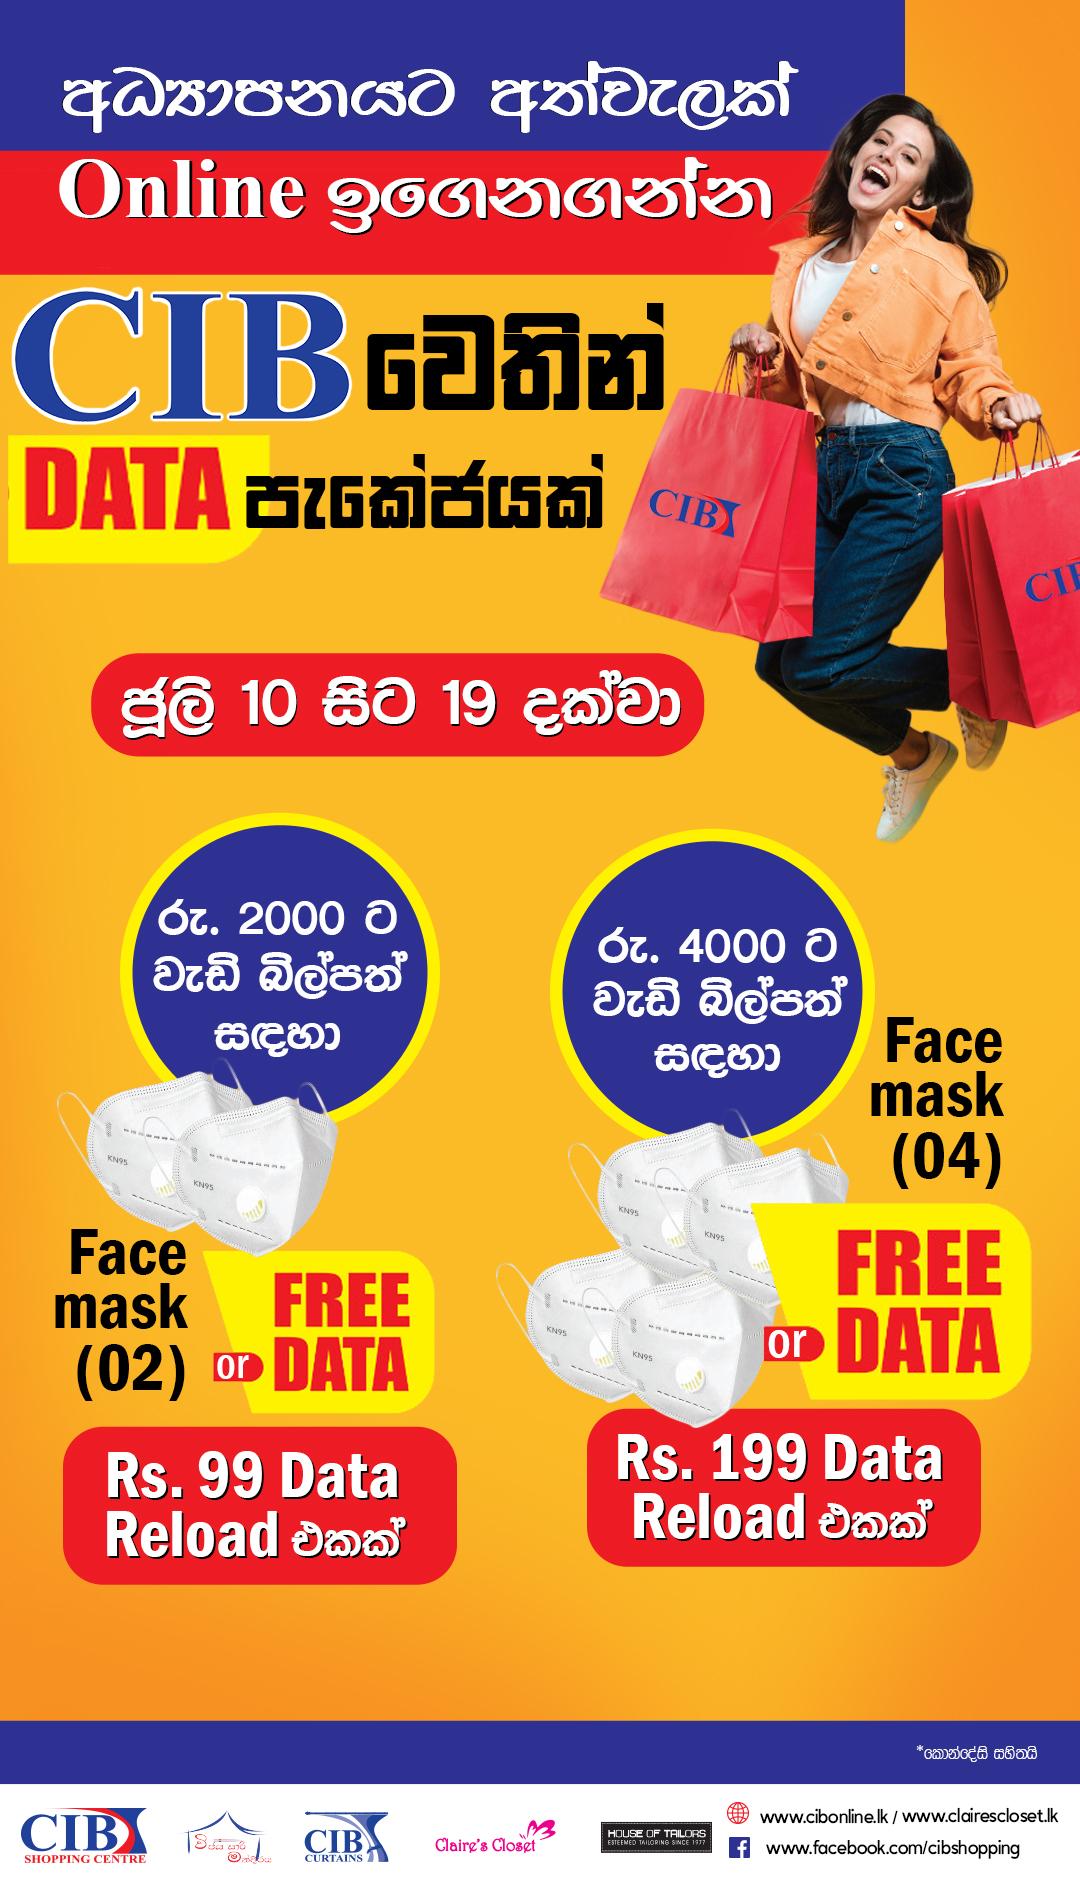 CIB Data Package Promo